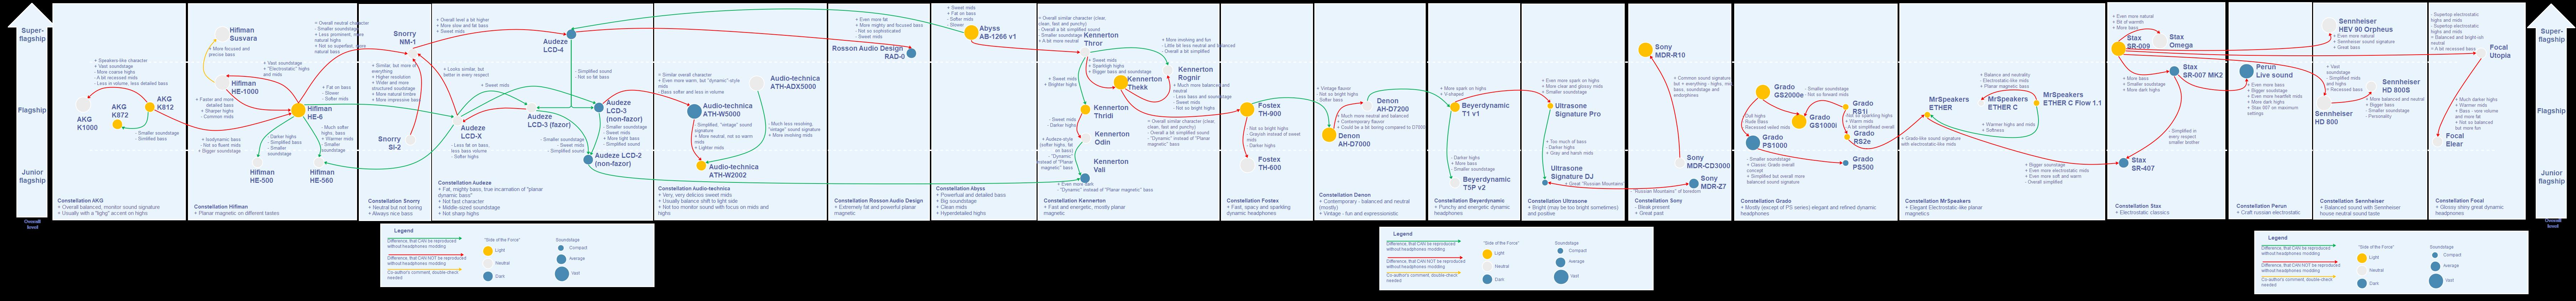 HP-starmap-20210704.png